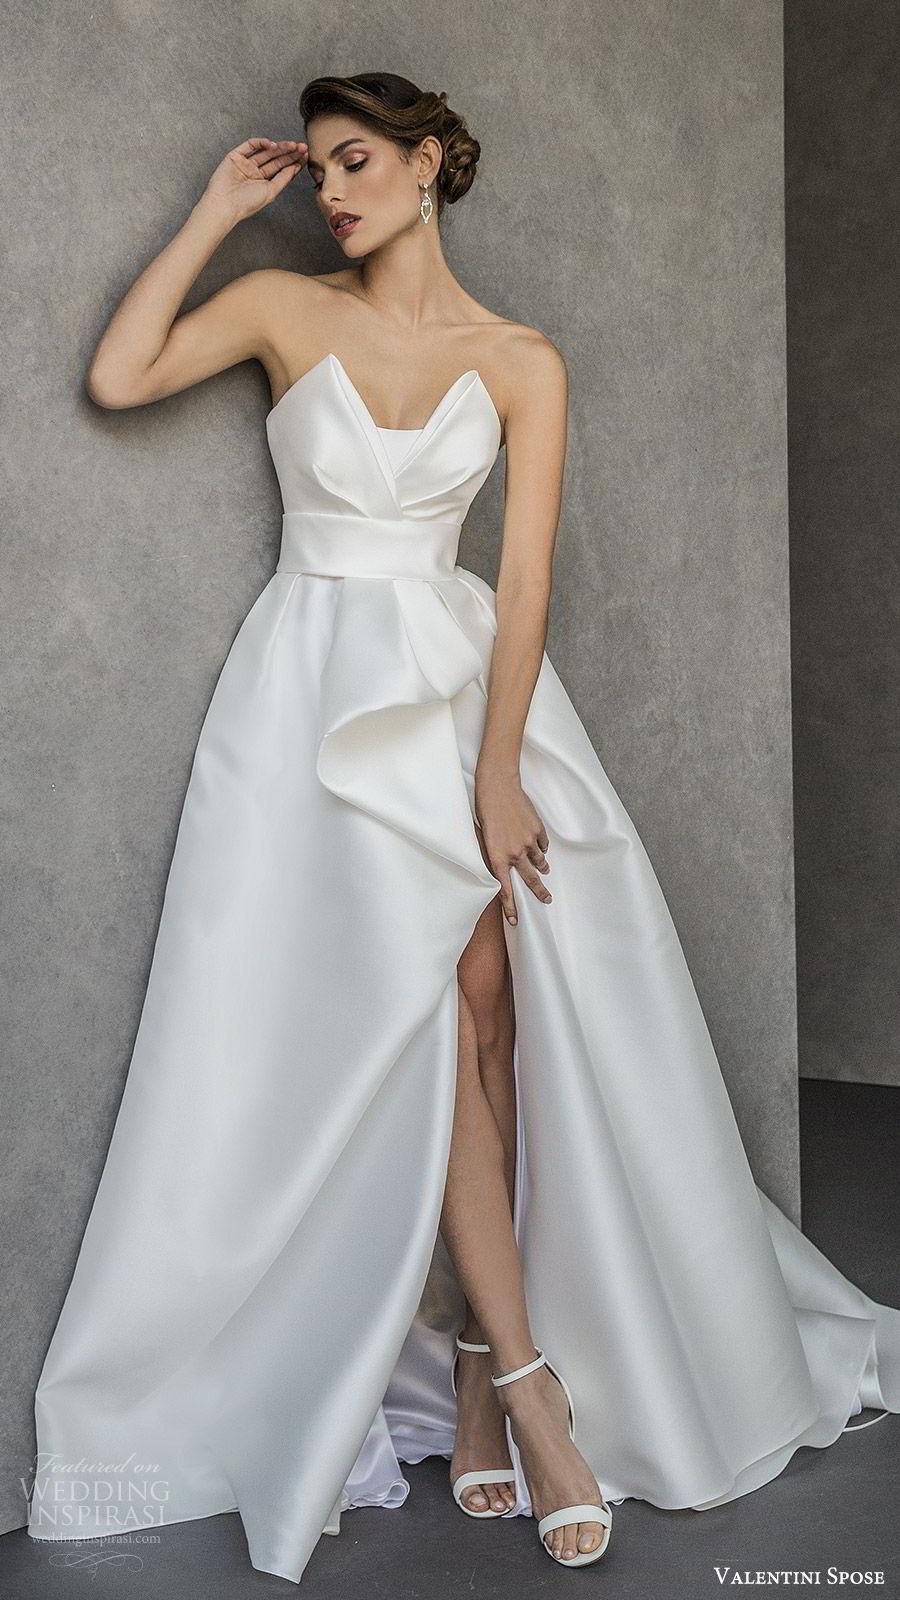 valentini spose spring 2020 bridal strapless sweetheart neckline slit skirt a line ball gown wedding dress (20) elegant modern chapel train mv